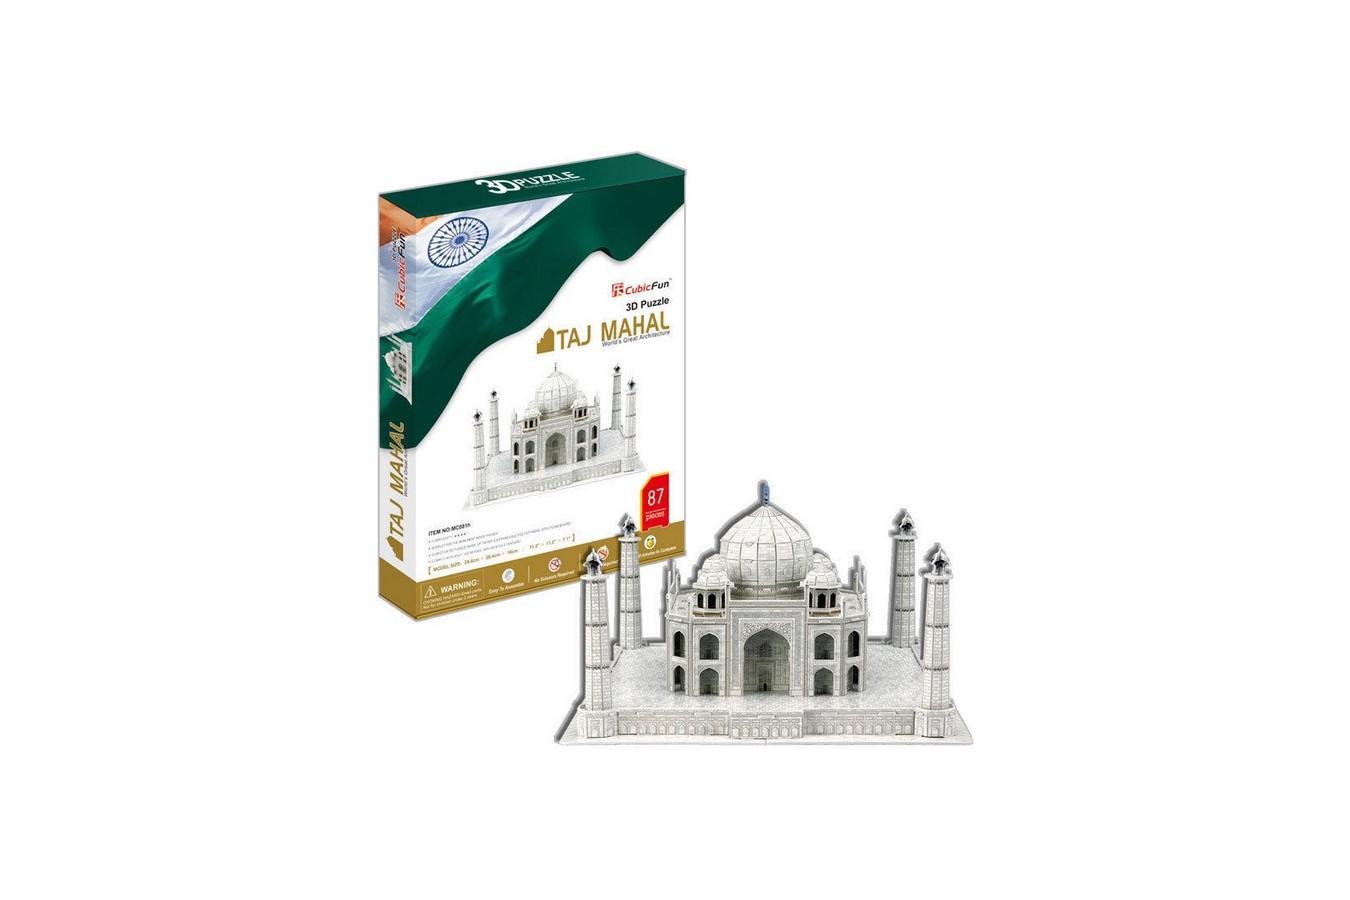 Puzzle 3D Cubic Fun - Taj Mahal, 87 piese (Cubic-Fun-MC081H) imagine